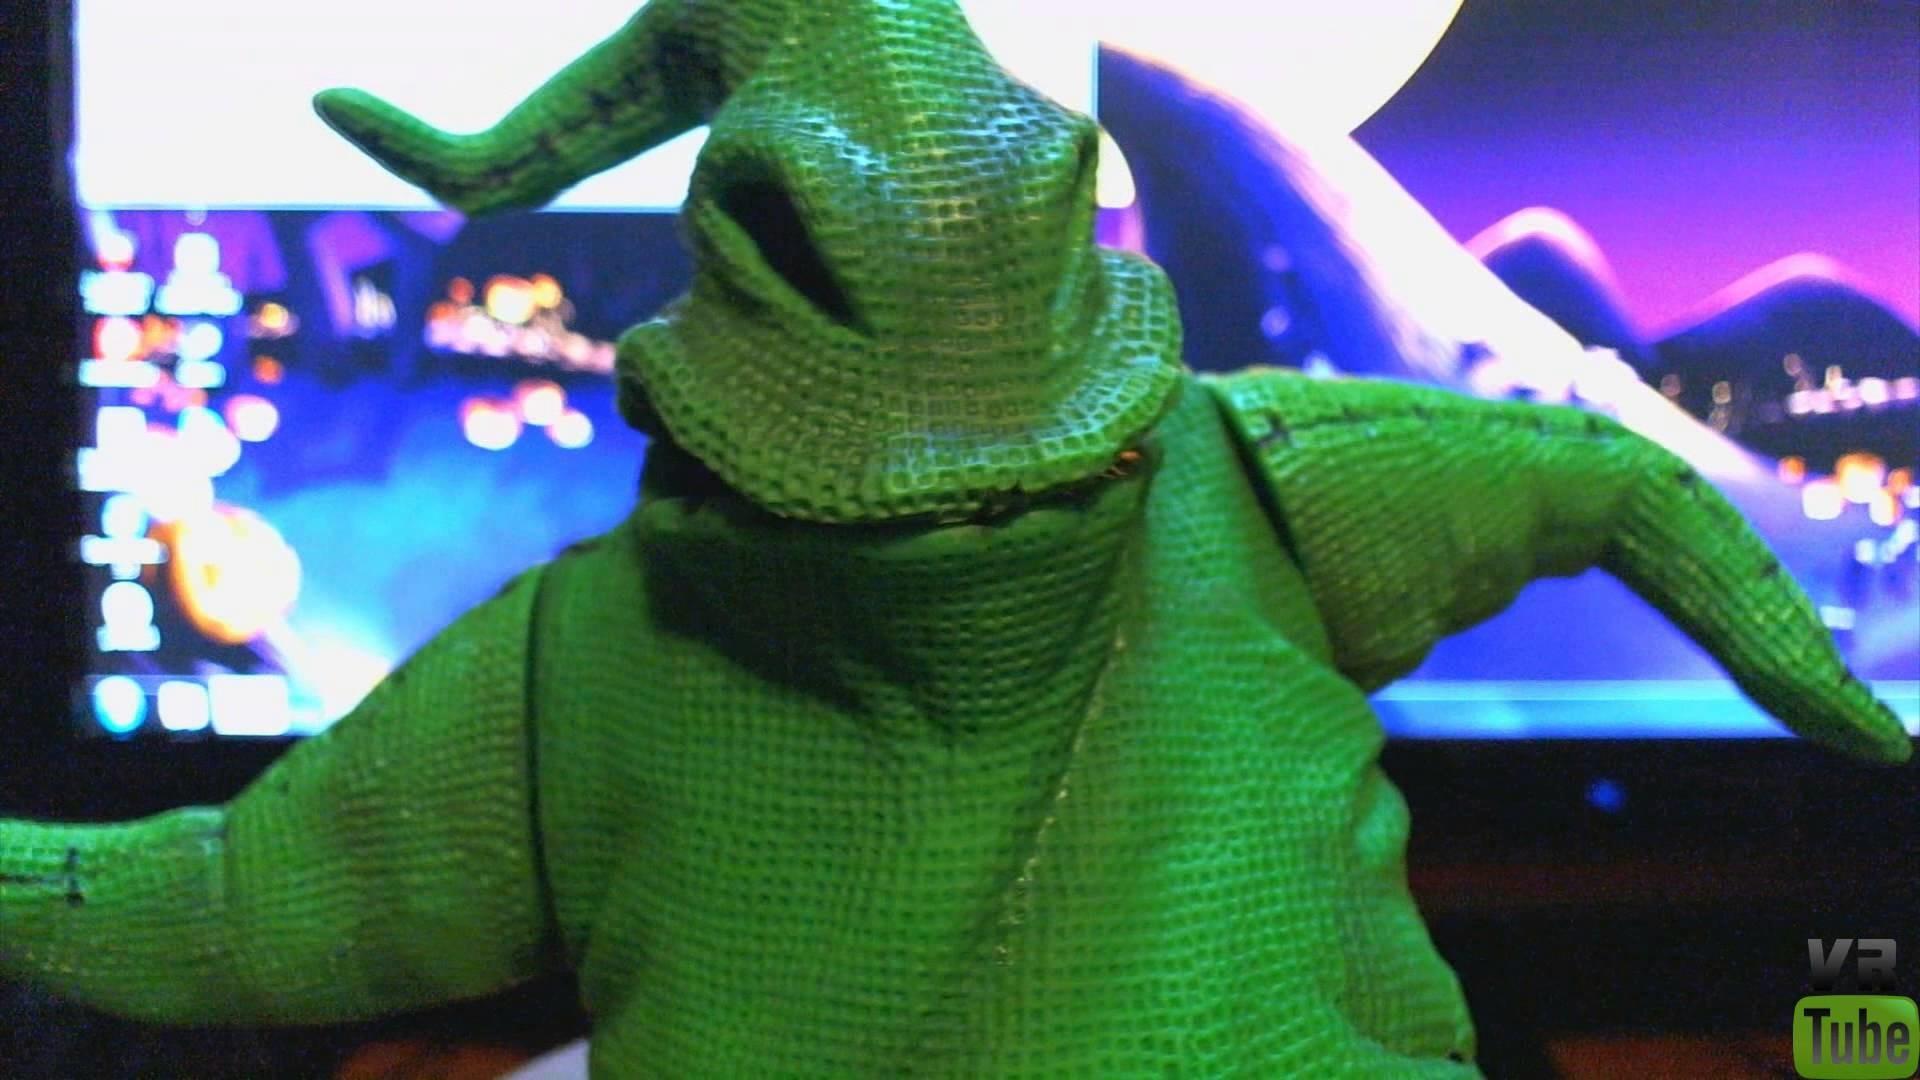 VR Reviews: NECA- Oogie Boogie vs Jack Skellington Box Set Review – YouTube